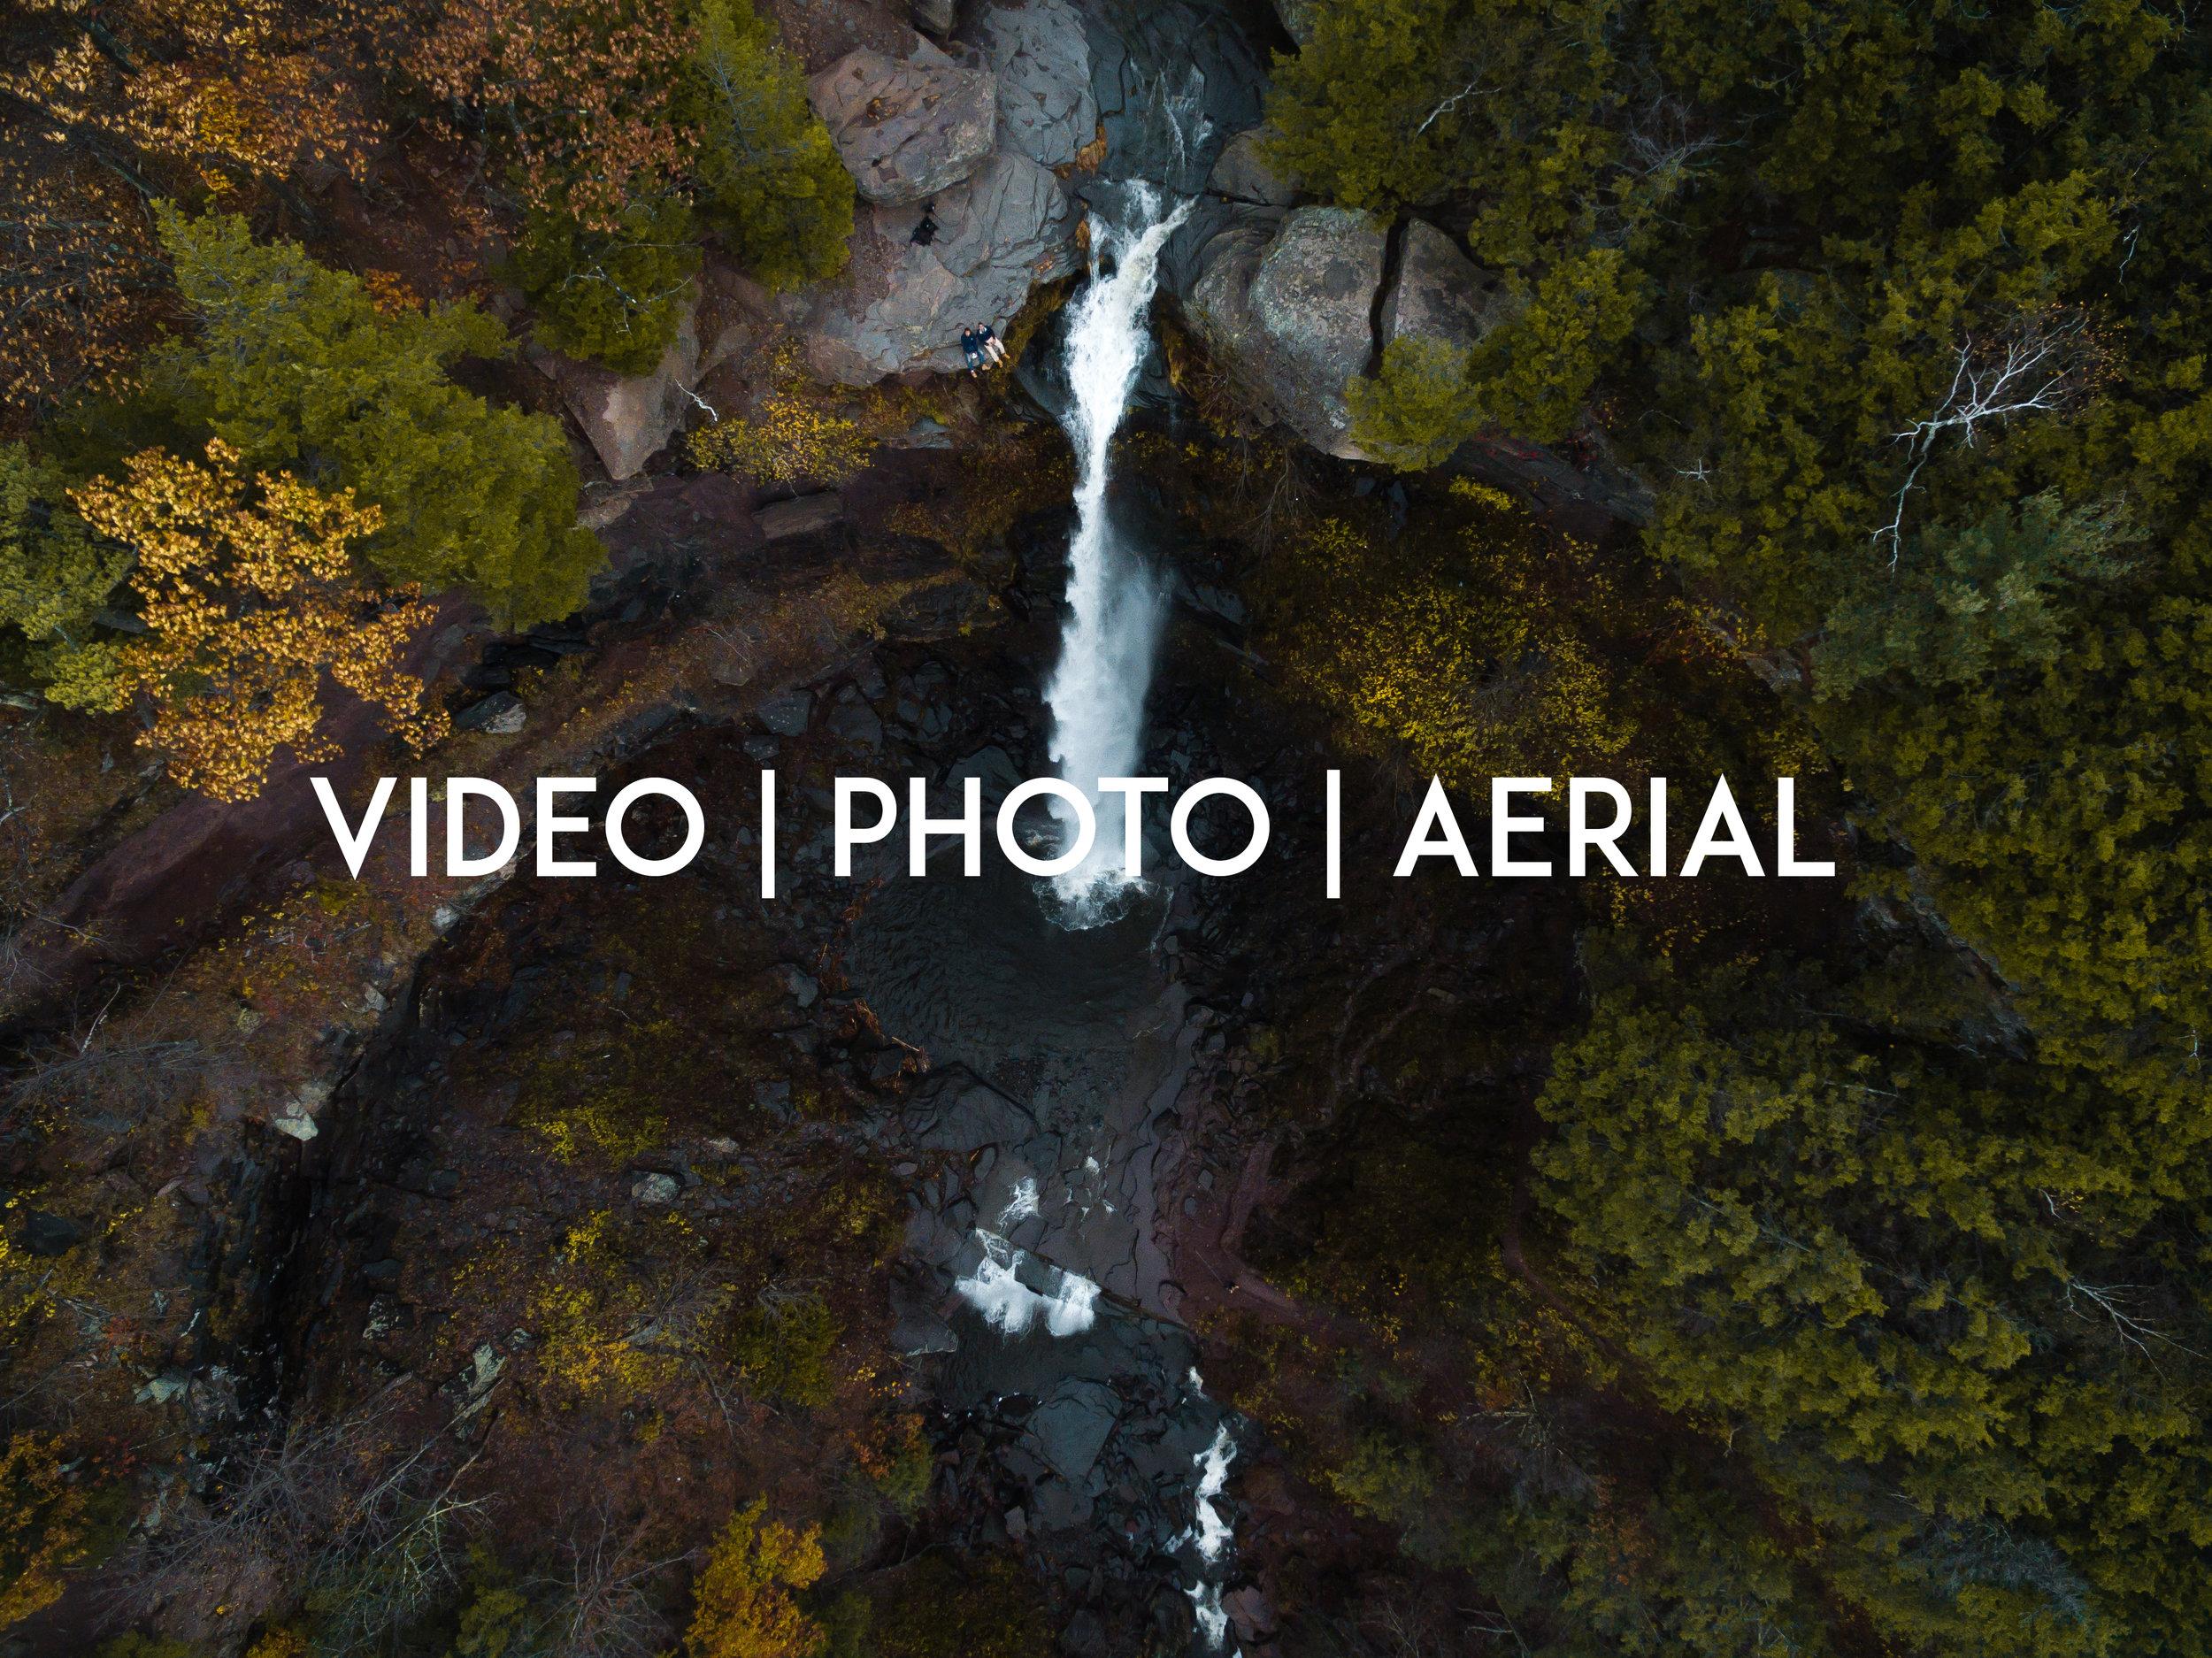 VIDEO PHOTO AERIAL.jpg